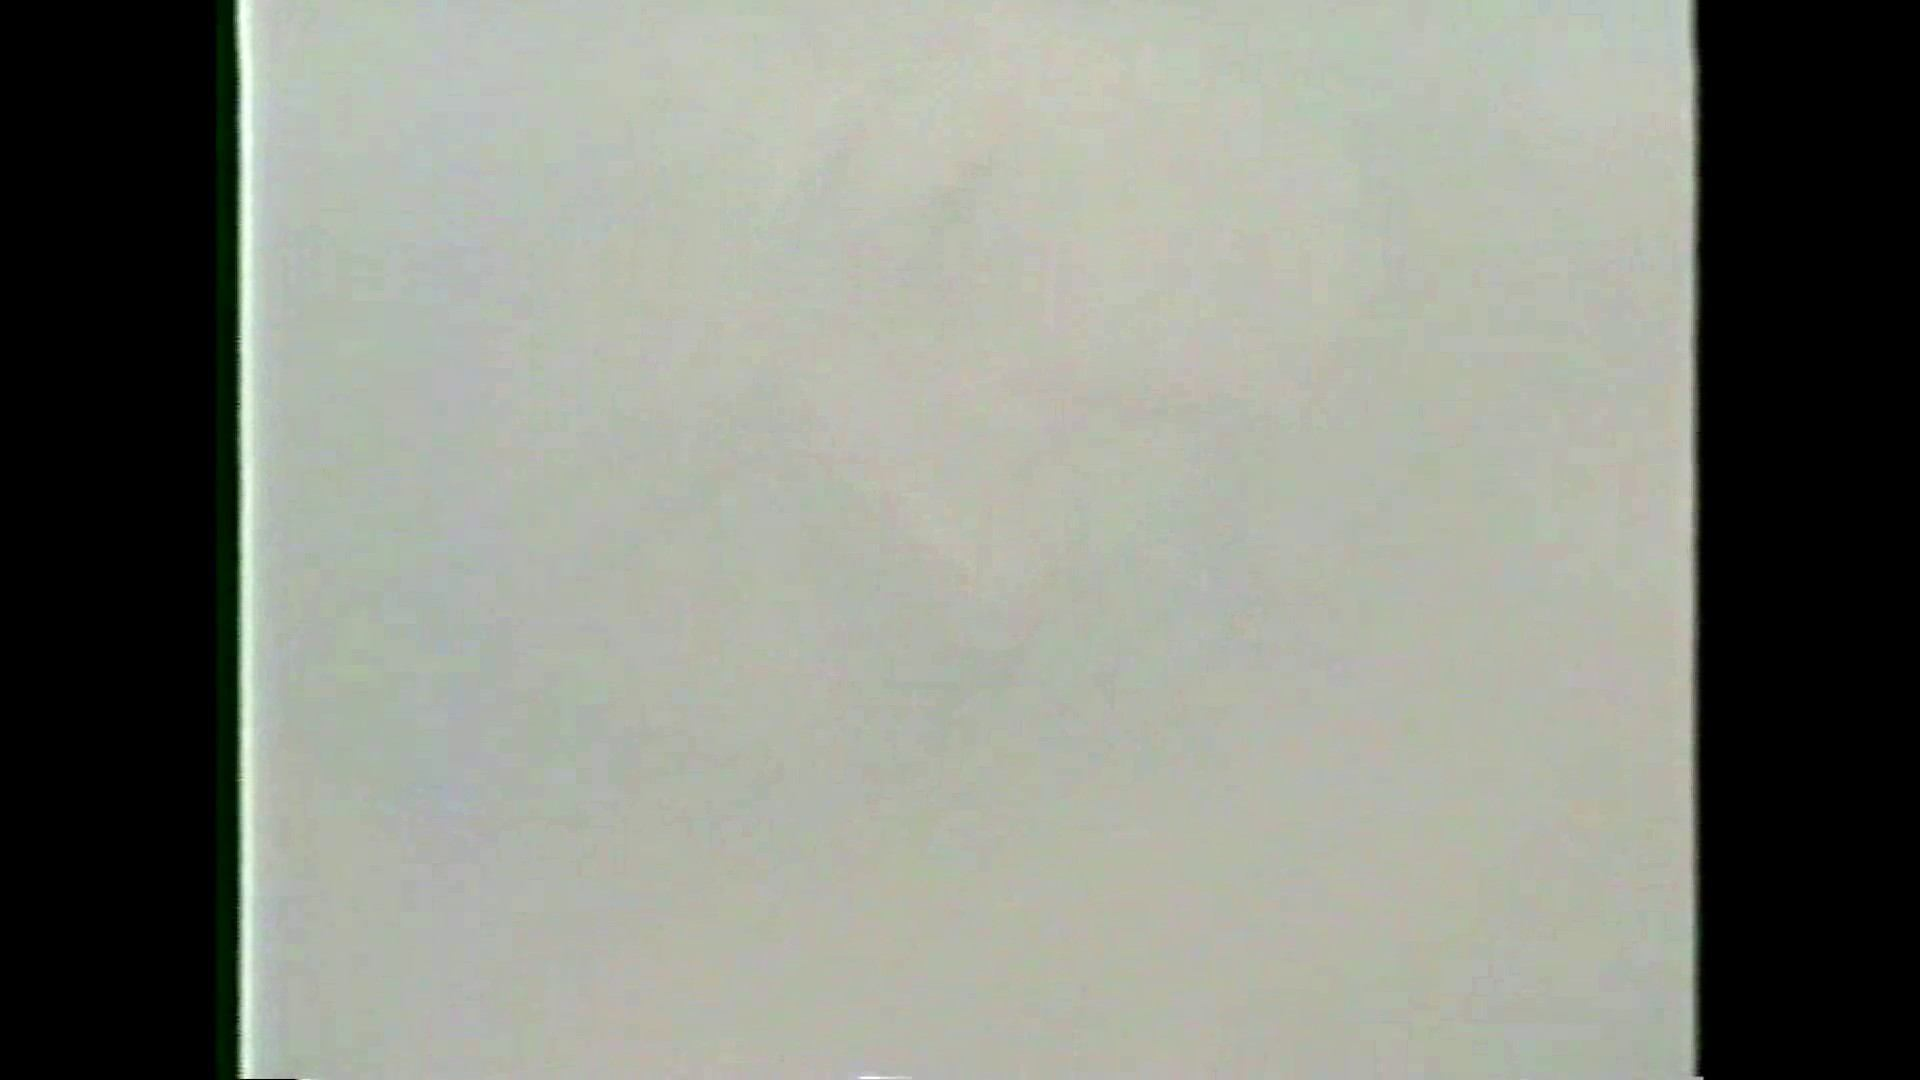 GAYBOY宏のオカズ倉庫Vol.3-4 フェラ最高 | オナニー ゲイ素人エロ画像 11連発 3